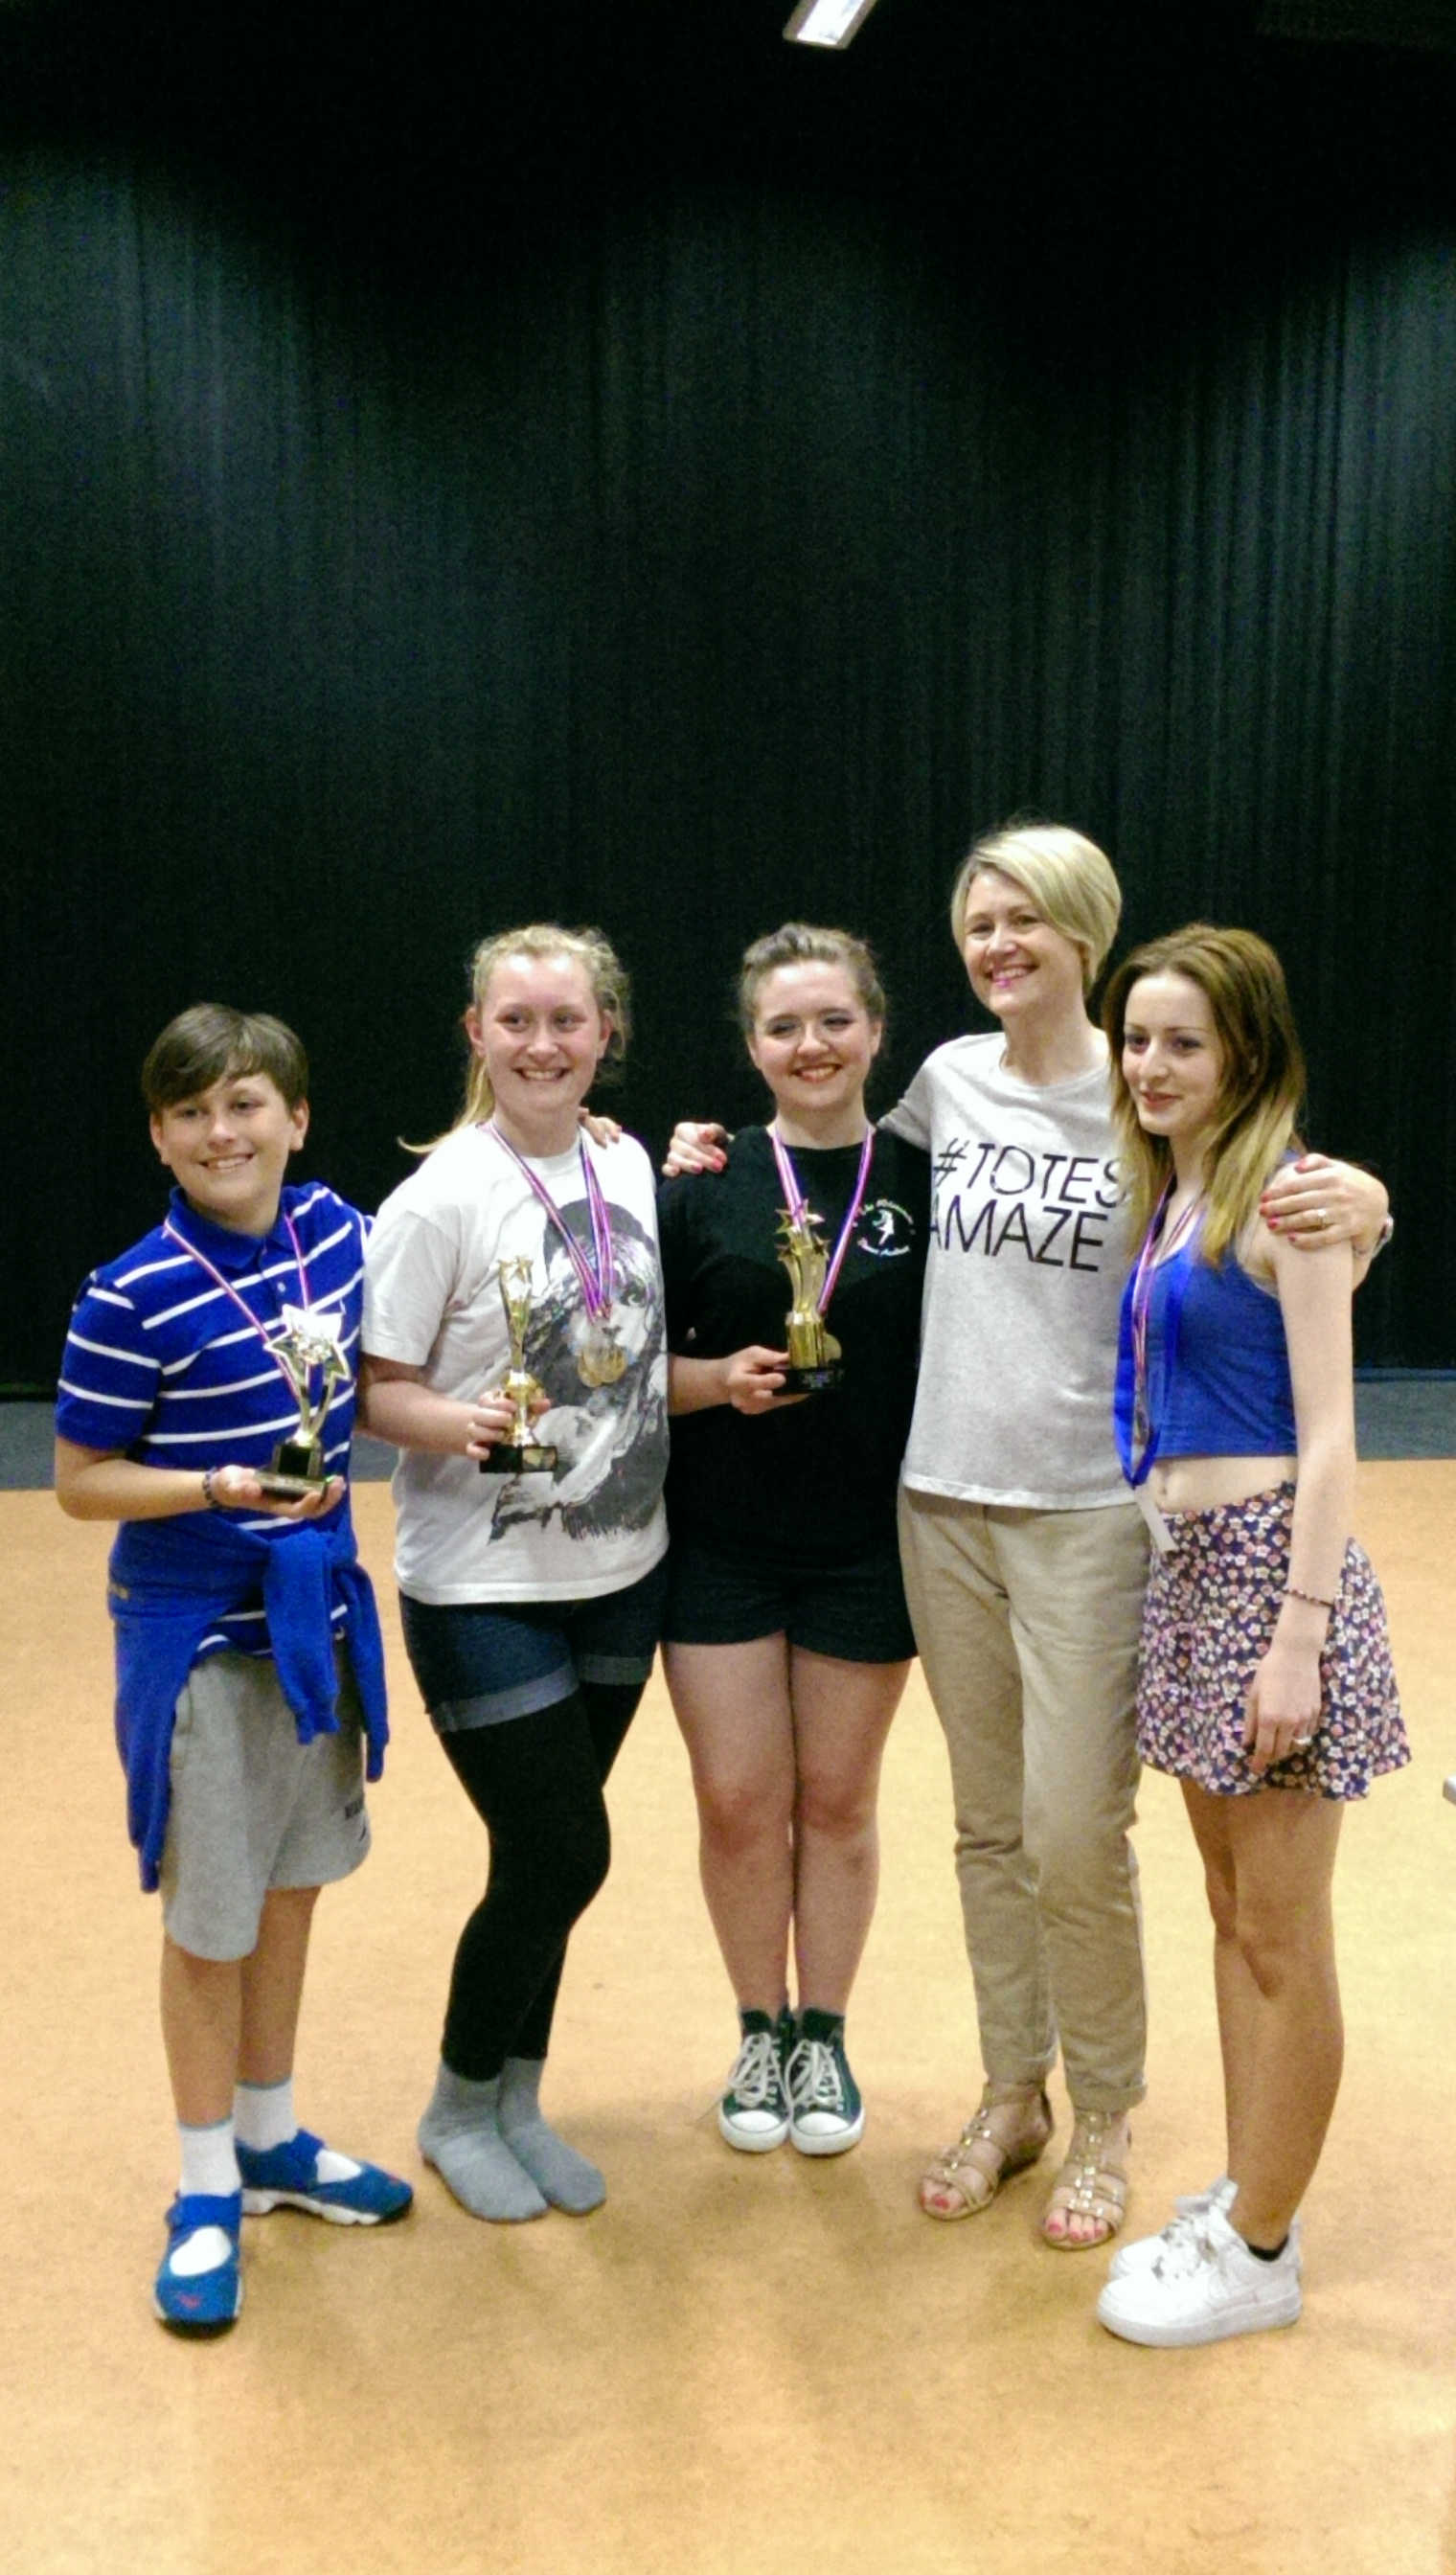 The Whiteman Dance Academy - Kenilworth, Warwickshire CV8 1LA - 07721 579174 | ShowMeLocal.com